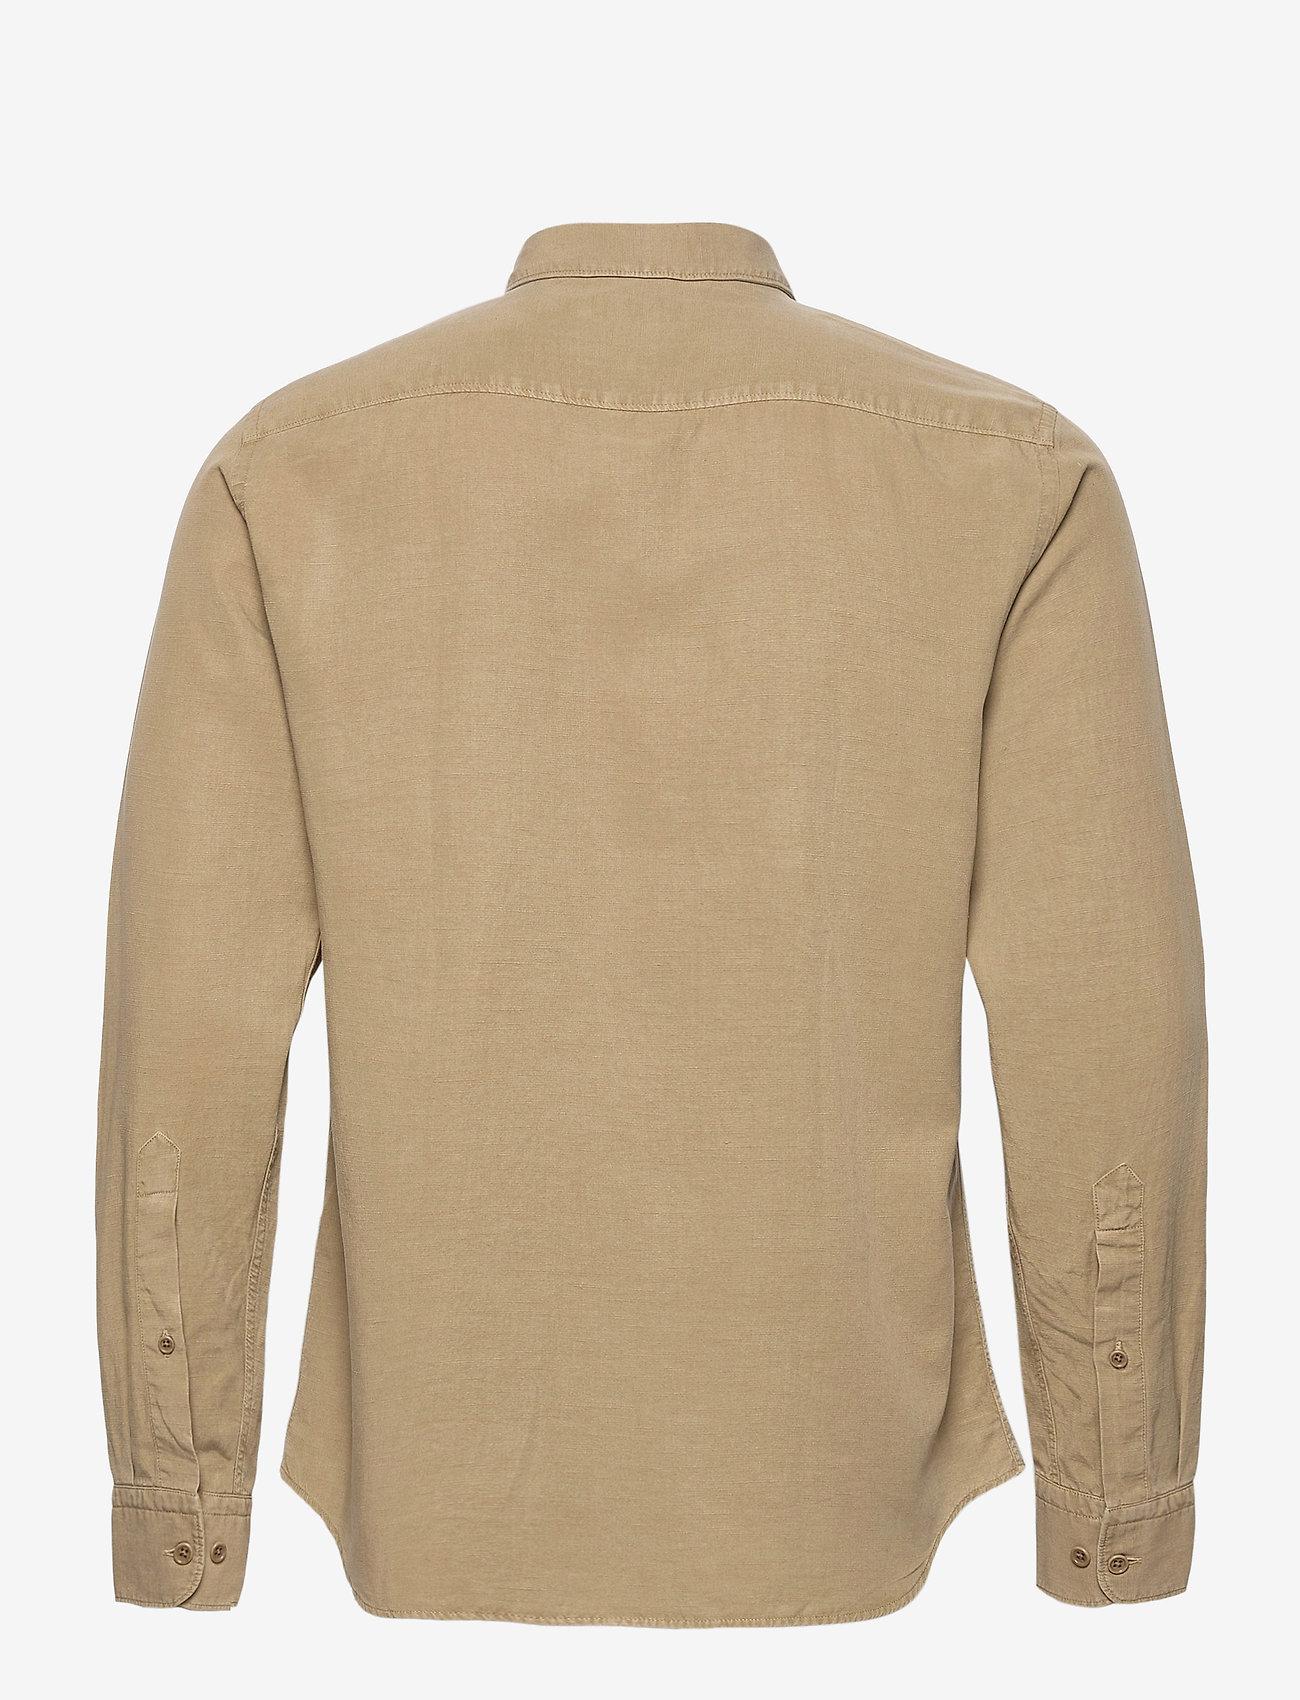 J. Lindeberg Tencel Slub Texture Slim Shirt - Skjorter WOOD BROWN - Menn Klær